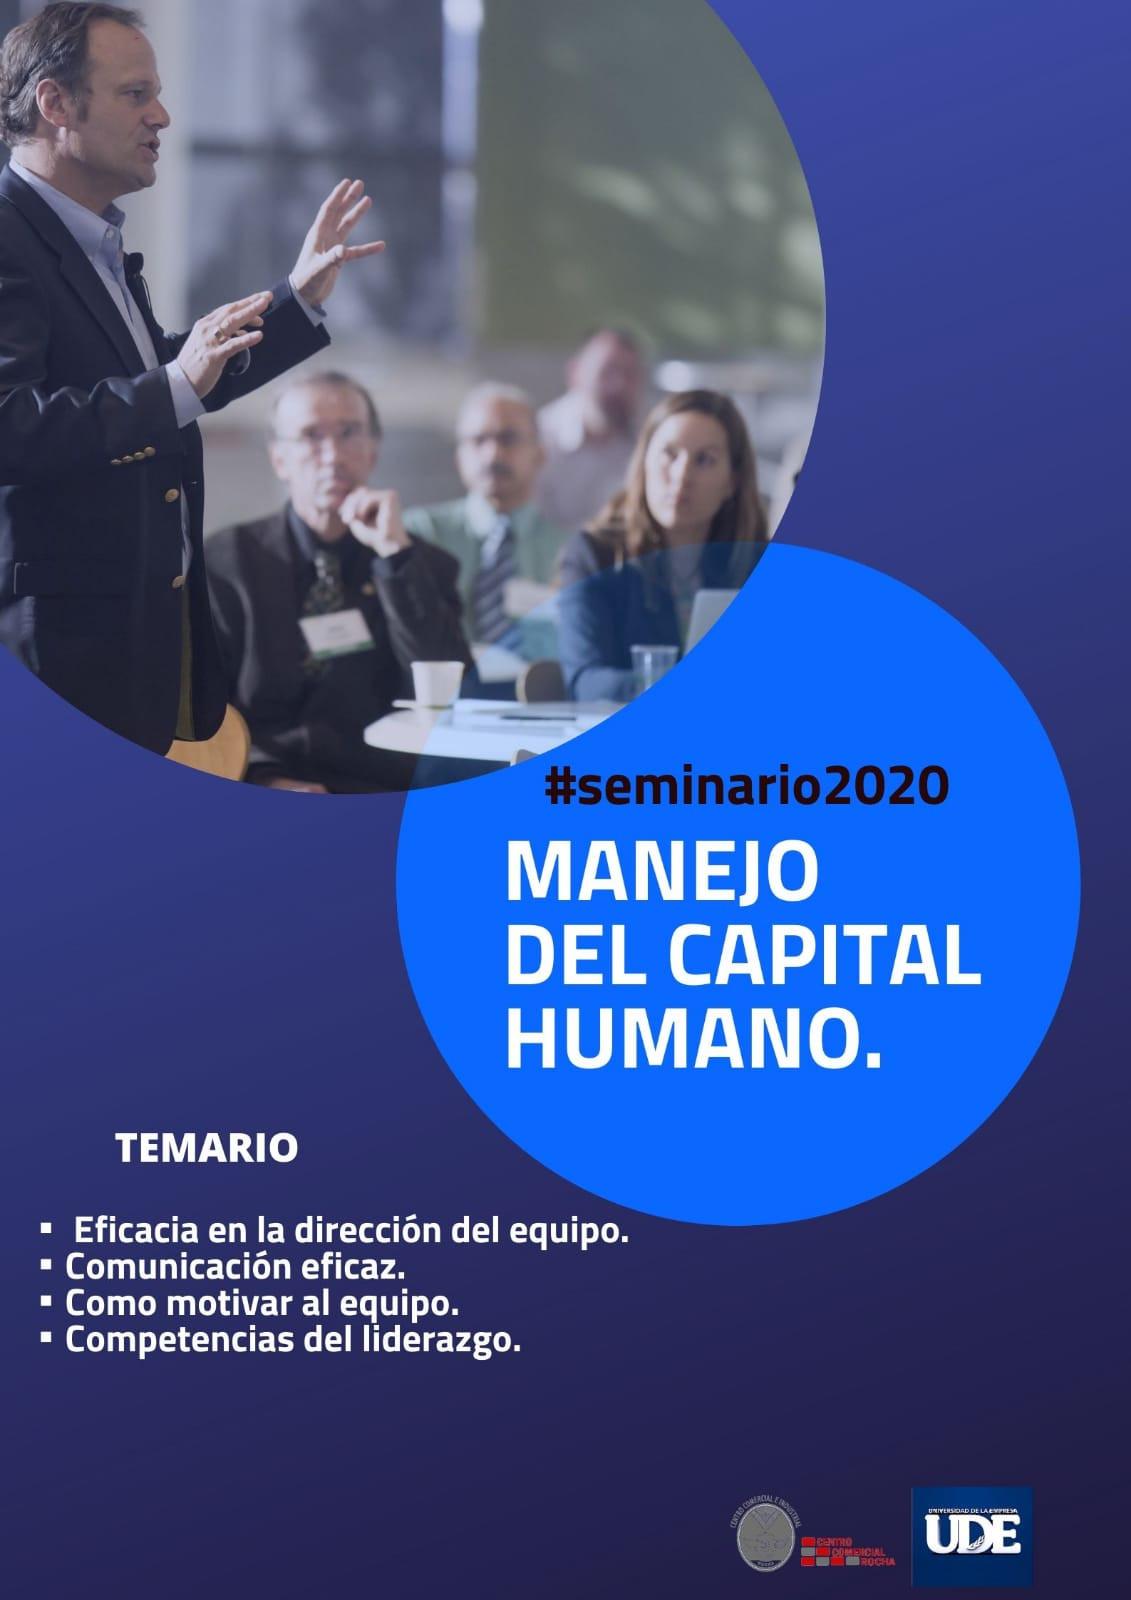 manejo_capital_humano